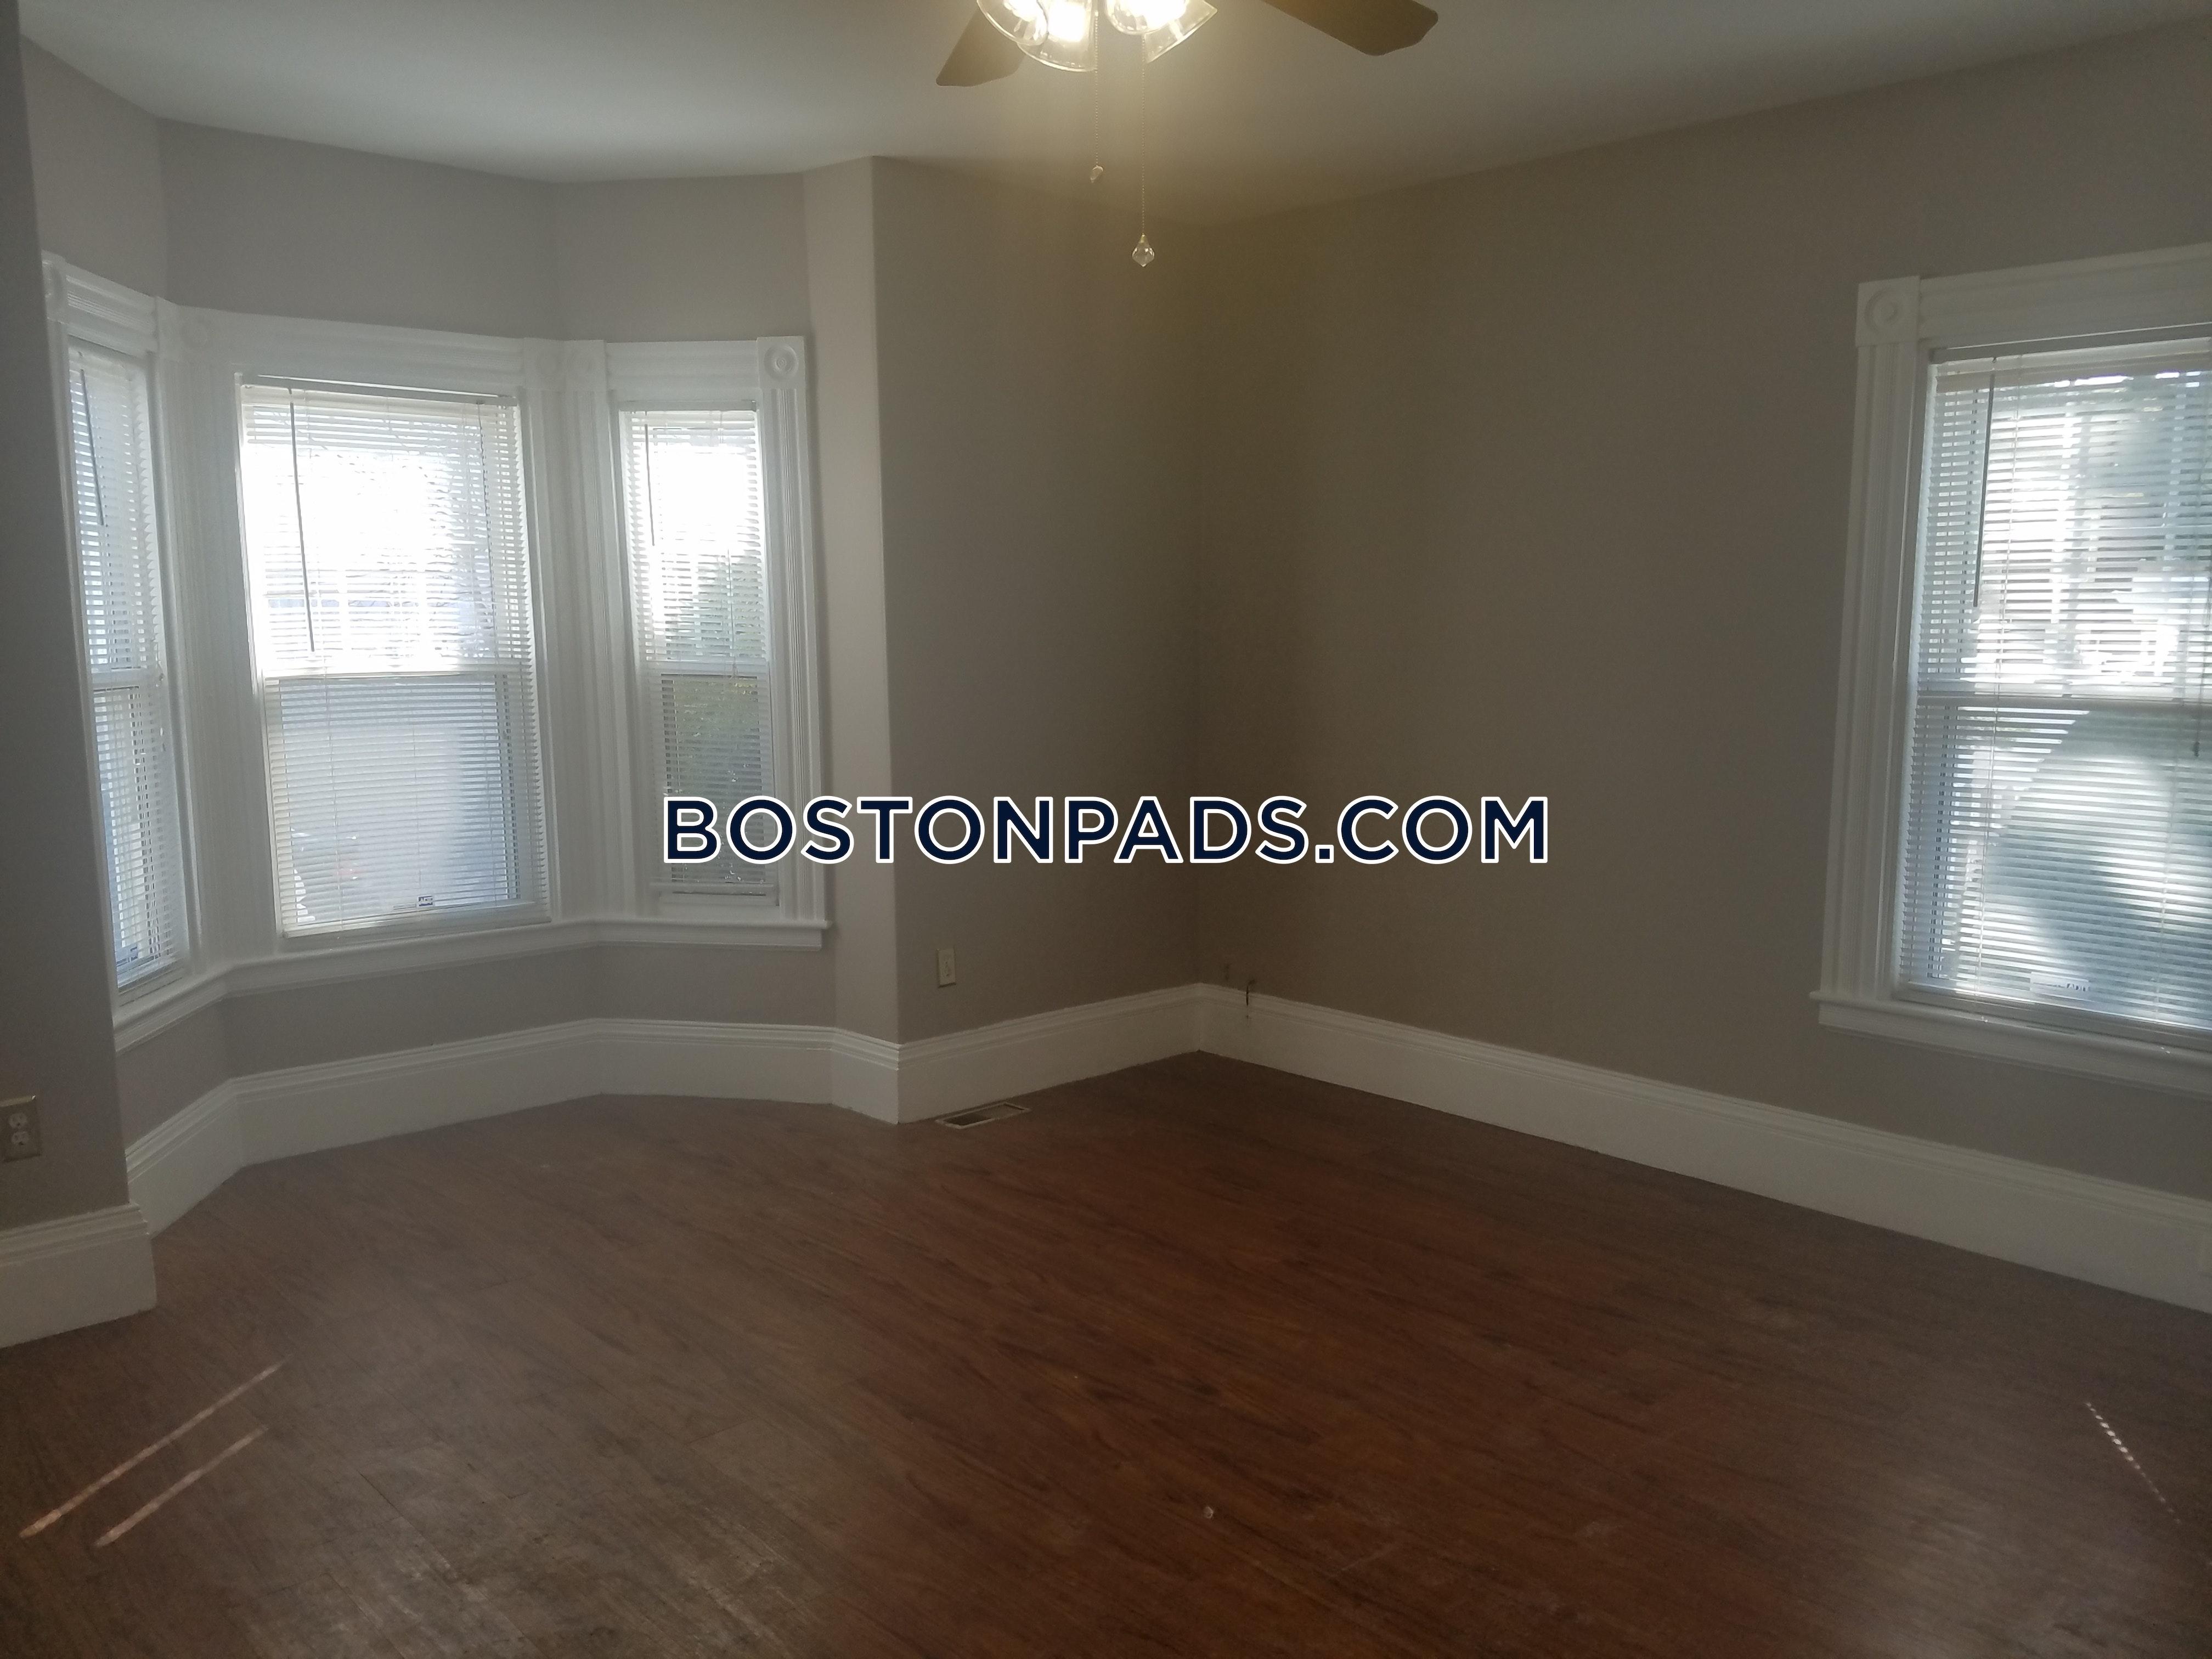 Dorchester Apartments   1 Bed 1 Bath - Boston - Dorchester/south ...